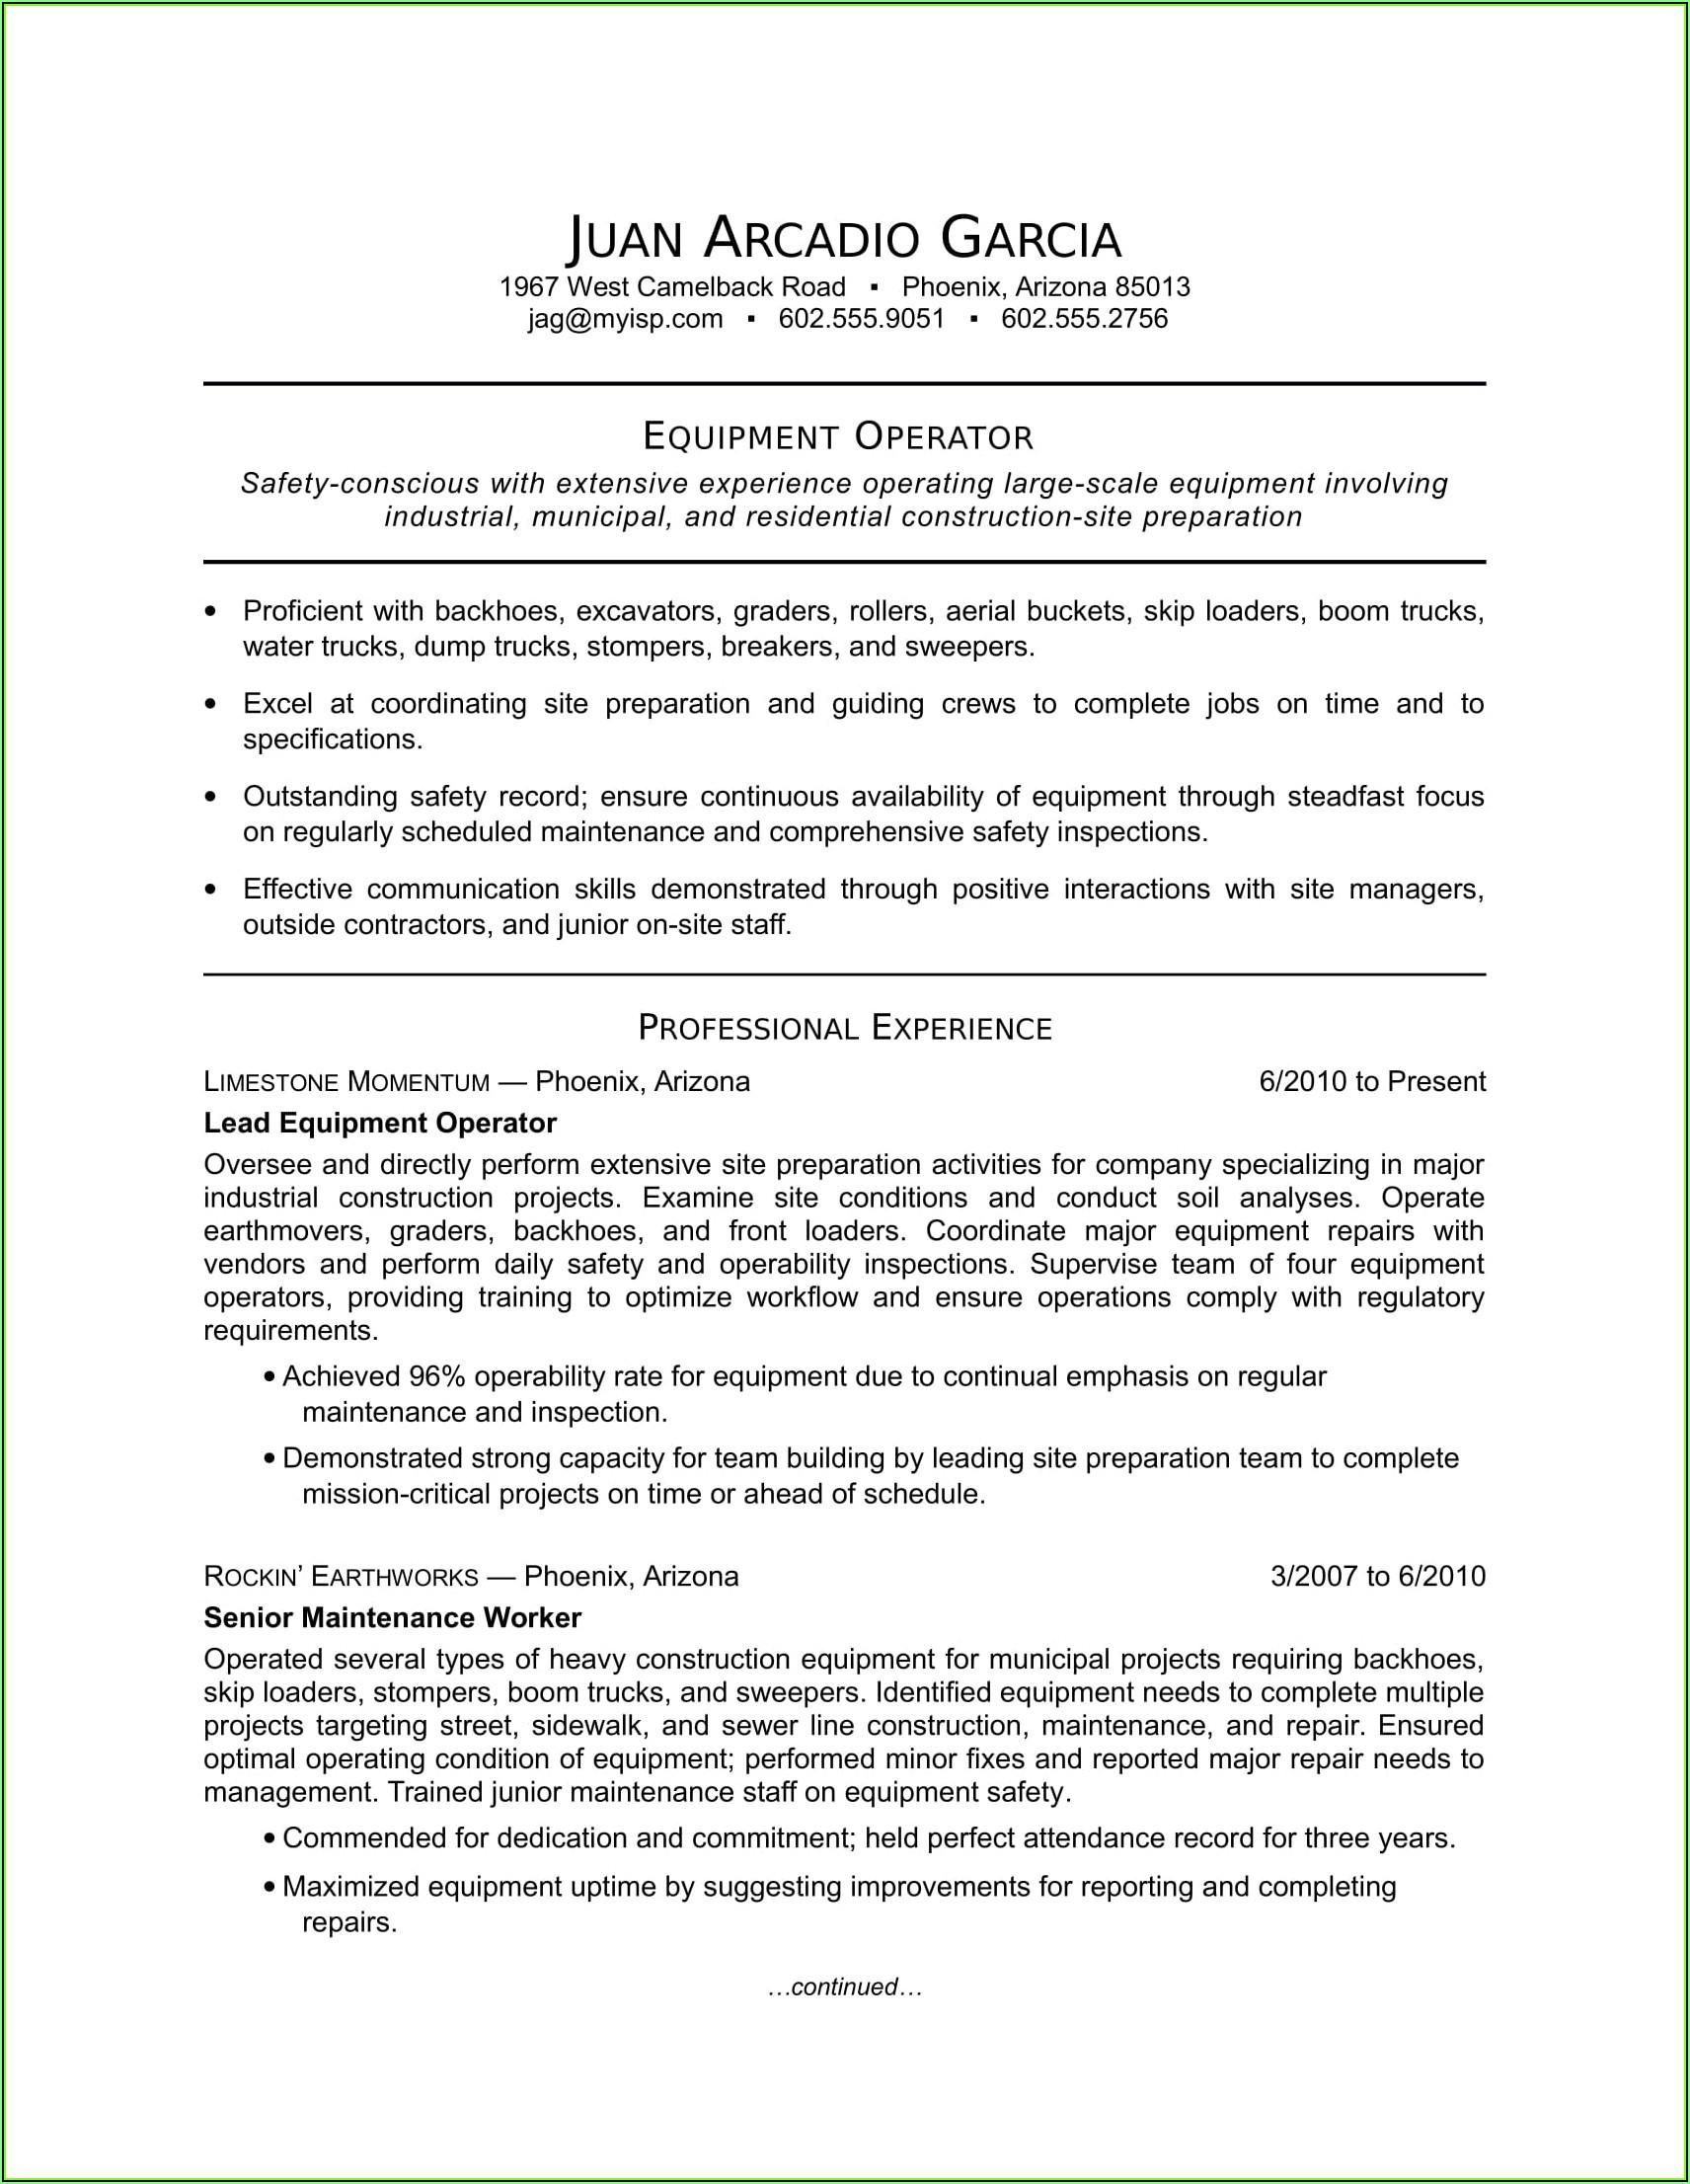 Resume Writing Services Phoenix Arizona